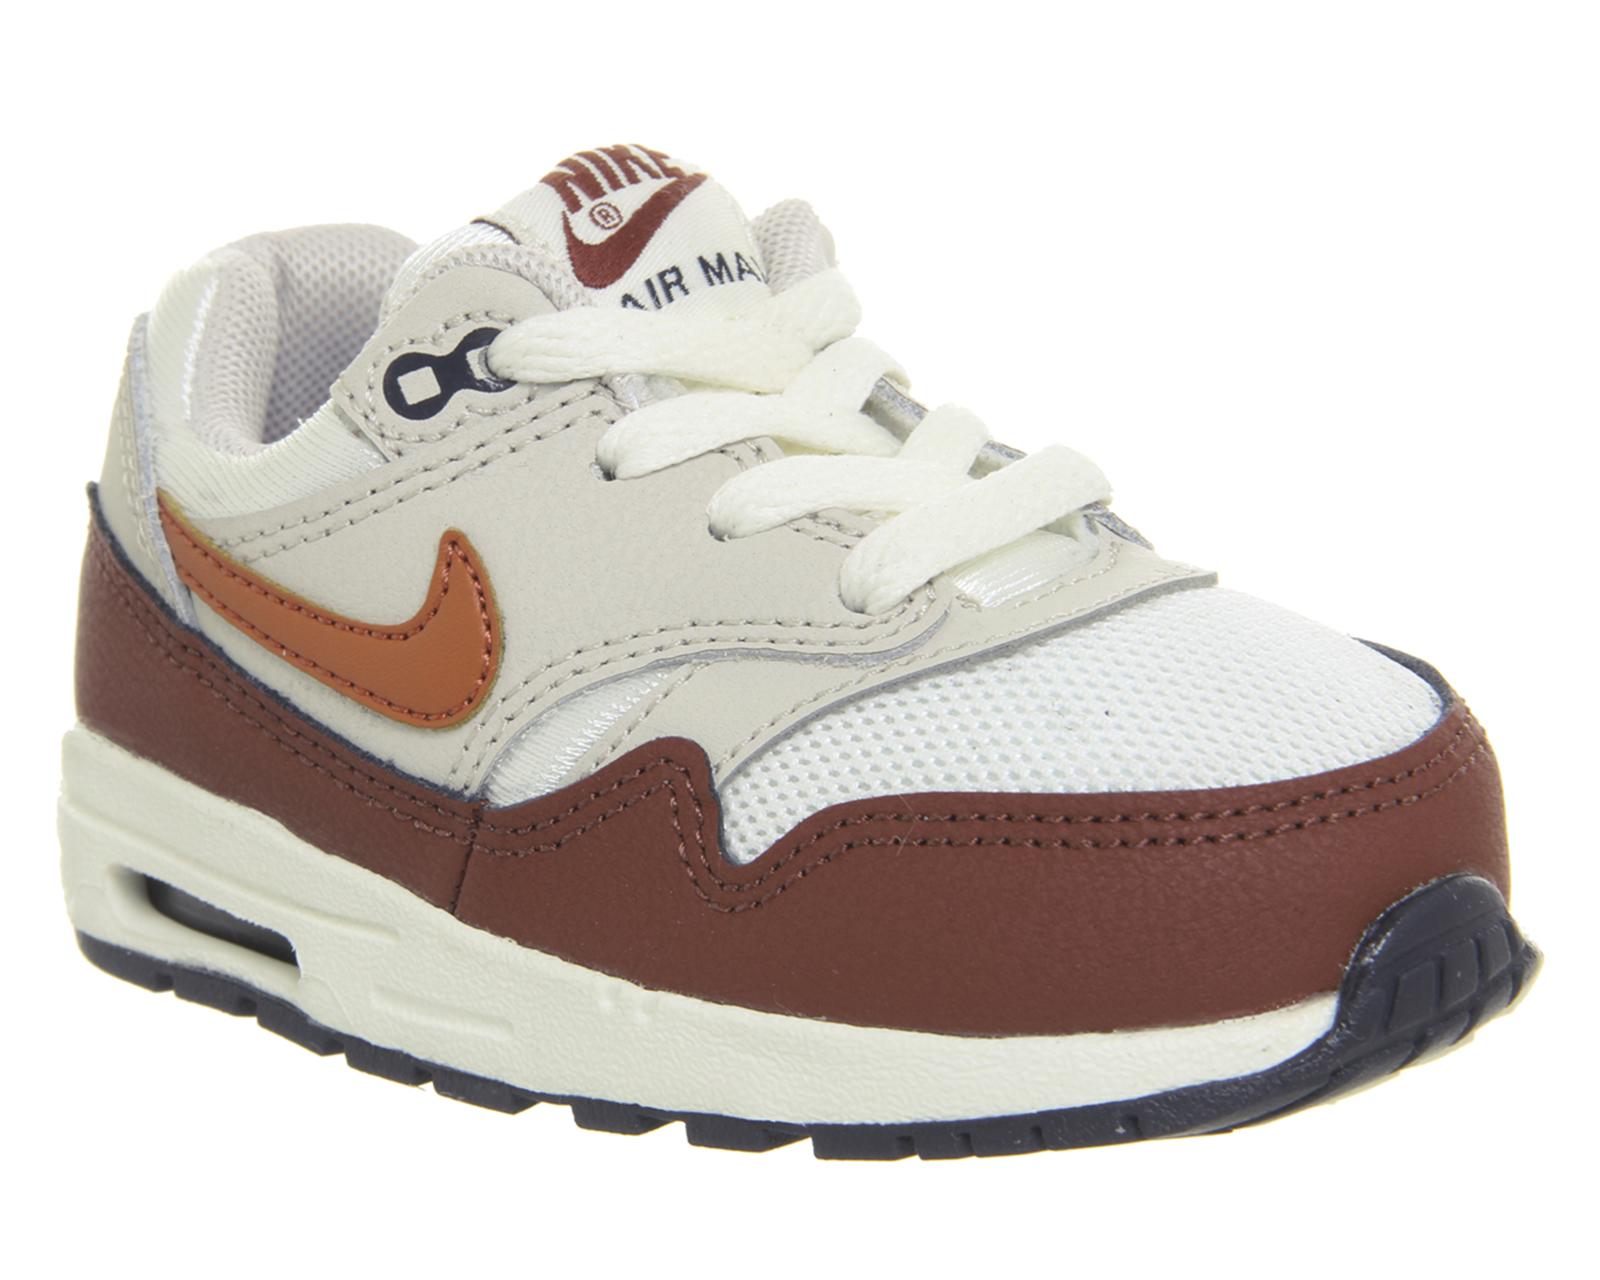 Very Goods | Nike Air Max 1 Td Sail Vintage Coral Mars Stone - Unisex